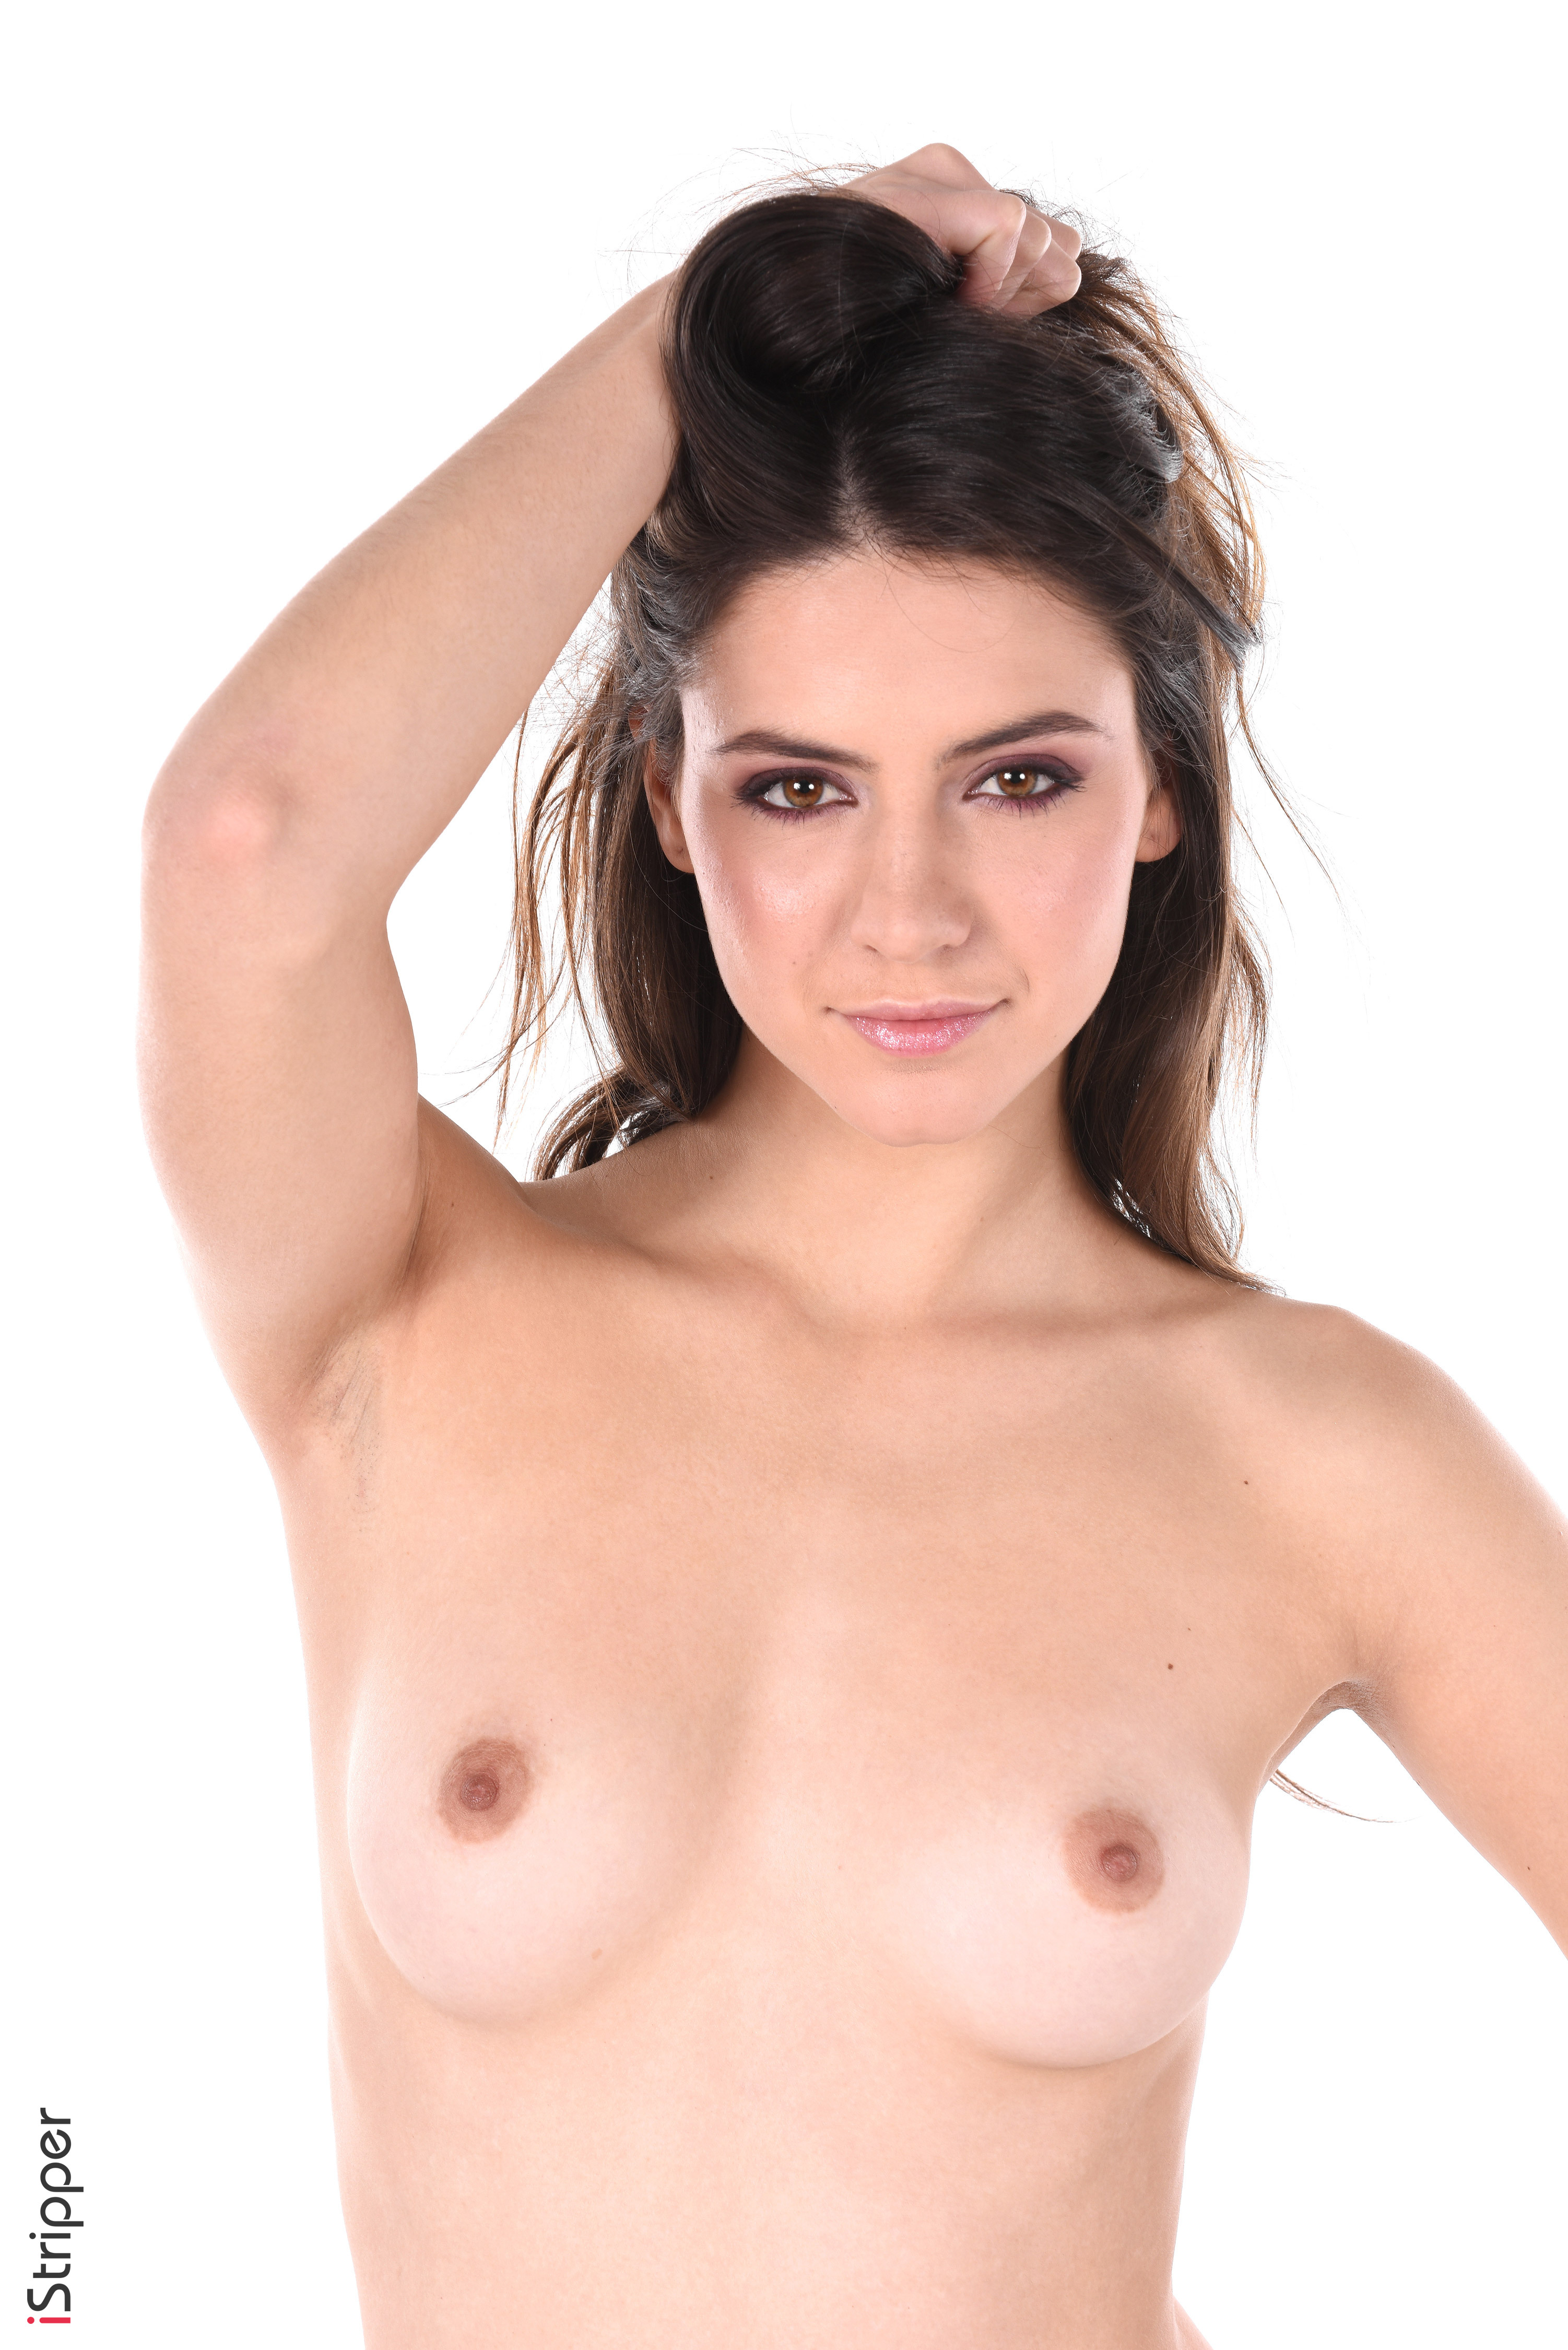 boobs wallpeper